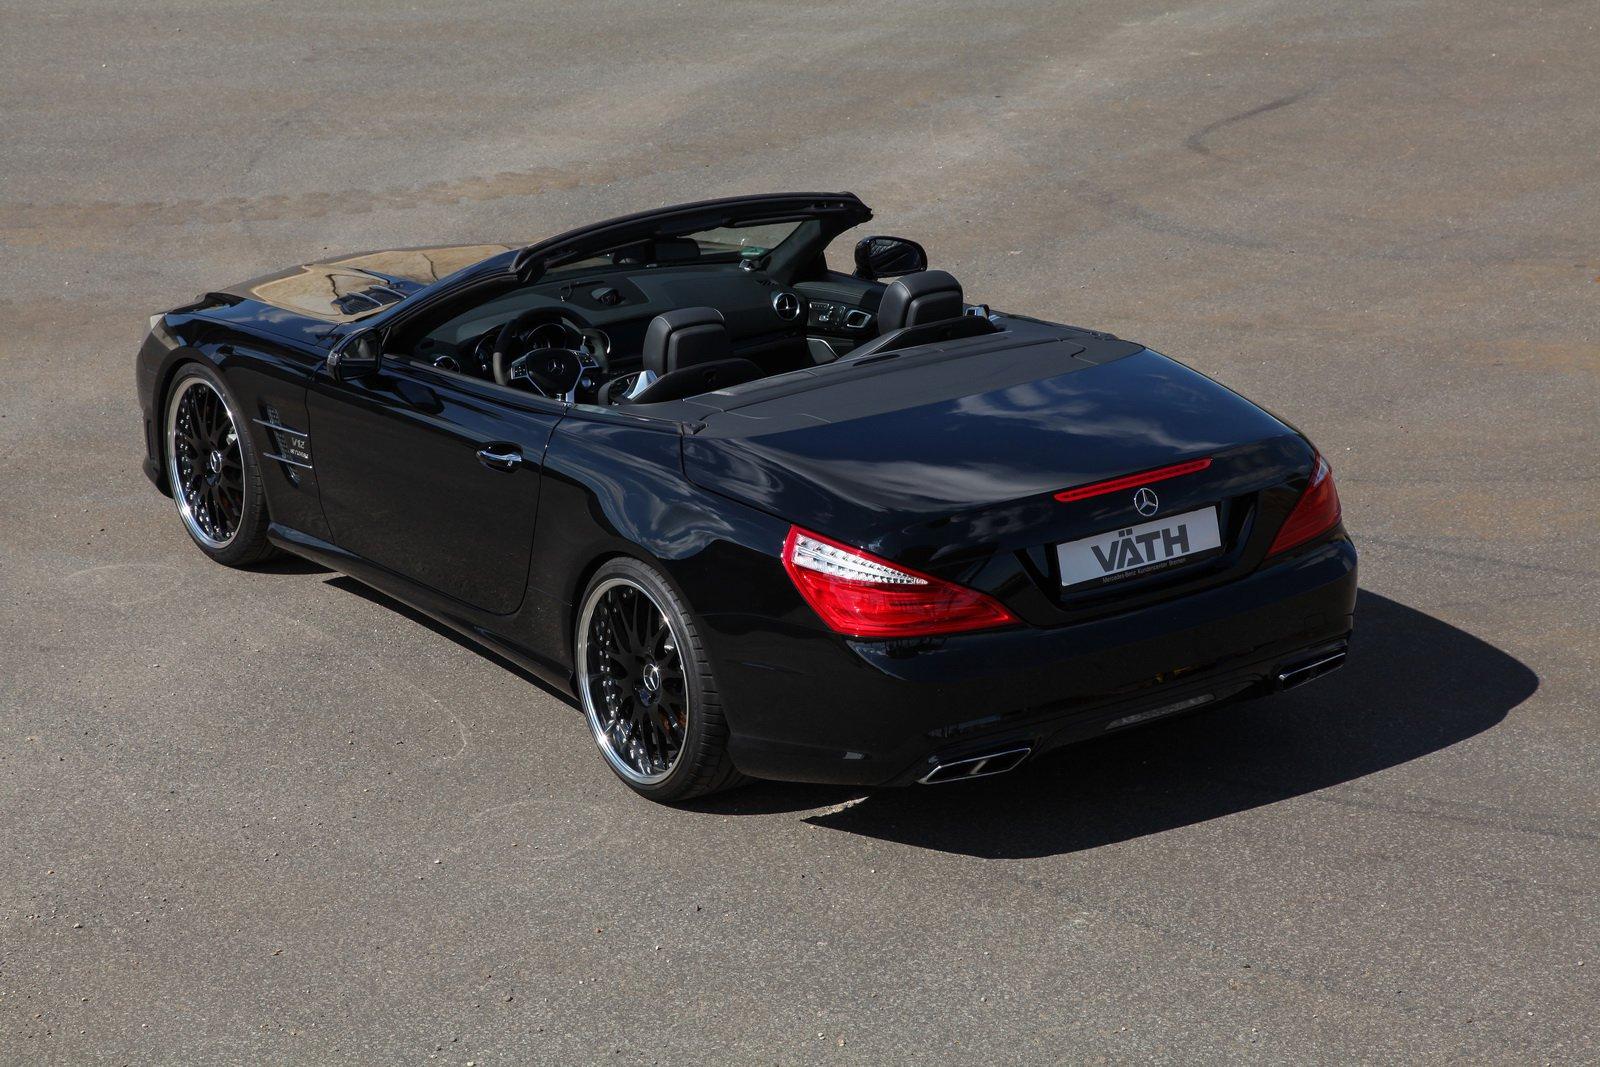 VATH добавил мощноти Mercedes-Benz SL 65 AMG